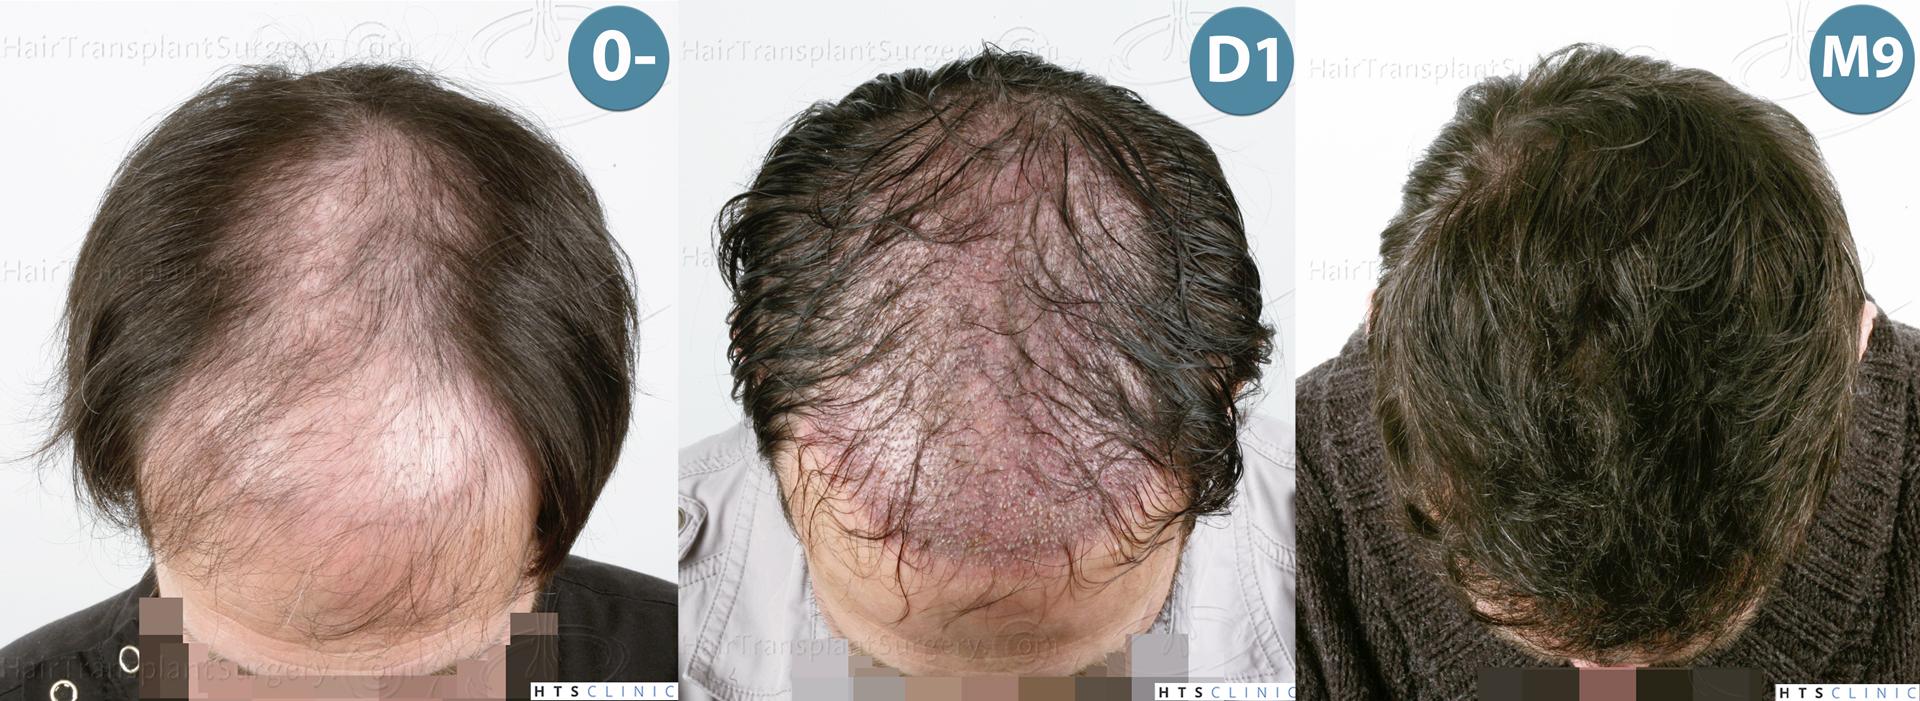 Dr.Devroye-HTS-Clinic-4510-Combo-FUT_FUE-Montage-2.jpg